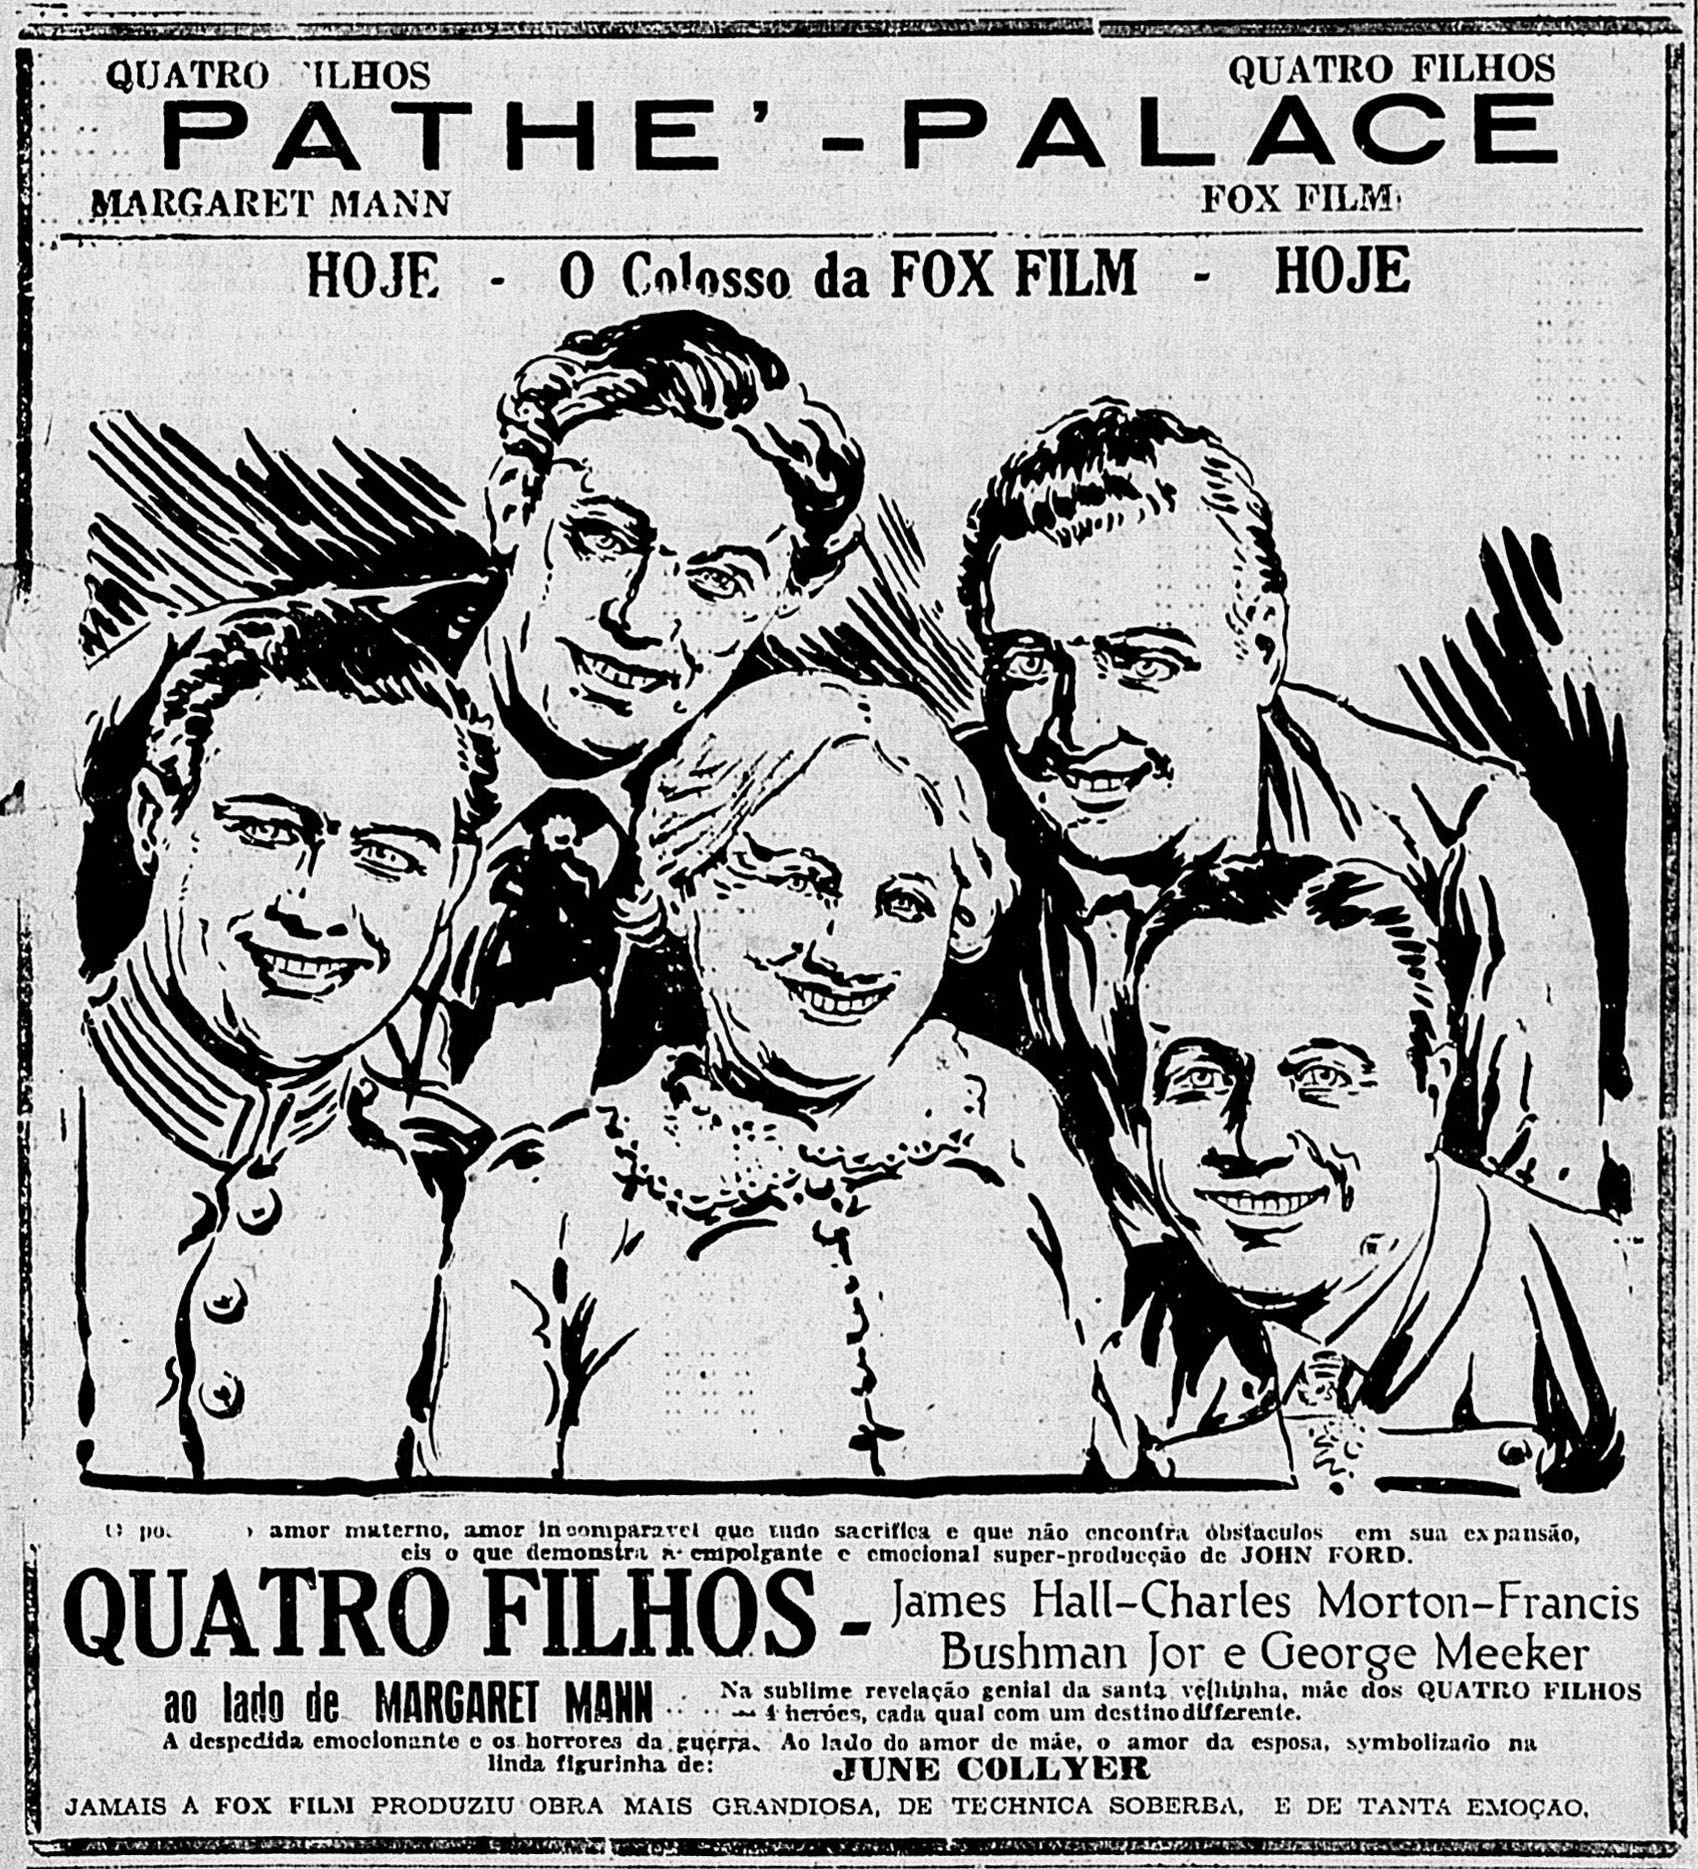 1928 Four Sons John Ford Diario Carioca Thursday September 4 1928 Rio De Janeiro Brazil With Images Historical Figures Memes Historical